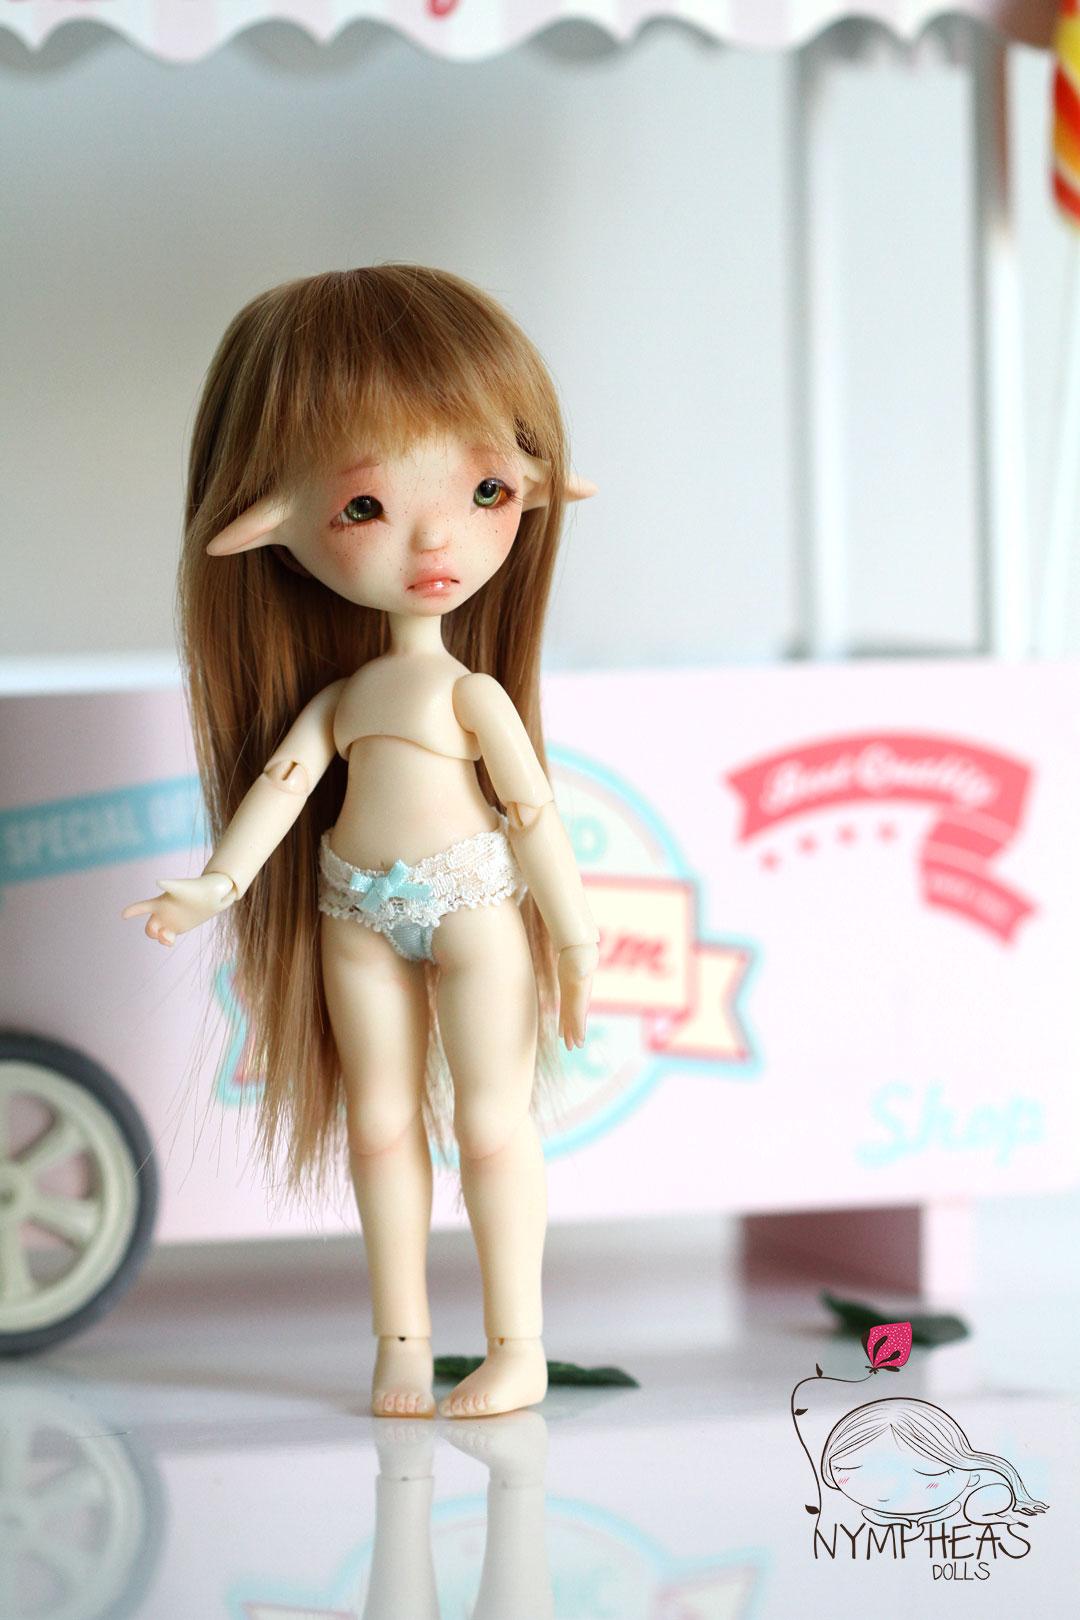 malicie-cream-nympheas-dolls-024